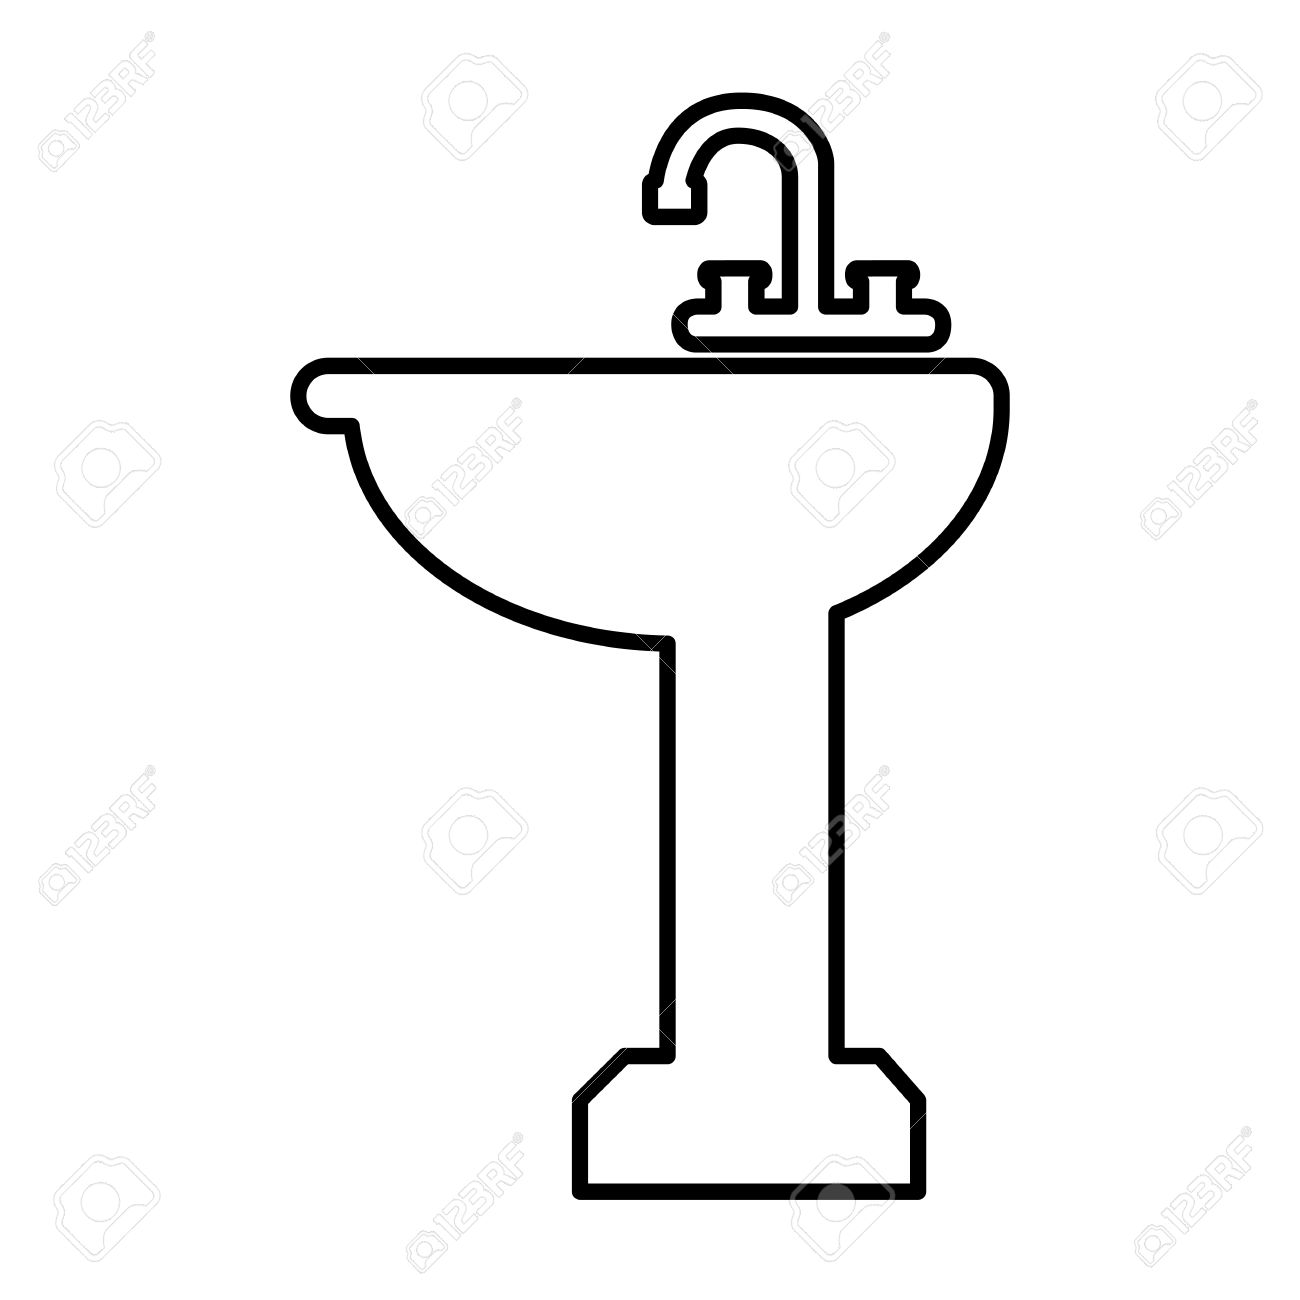 Bathroom sink clip art - Bathroom Sink Line Icon Vector Illustration On White Background Stock Vector 50824031